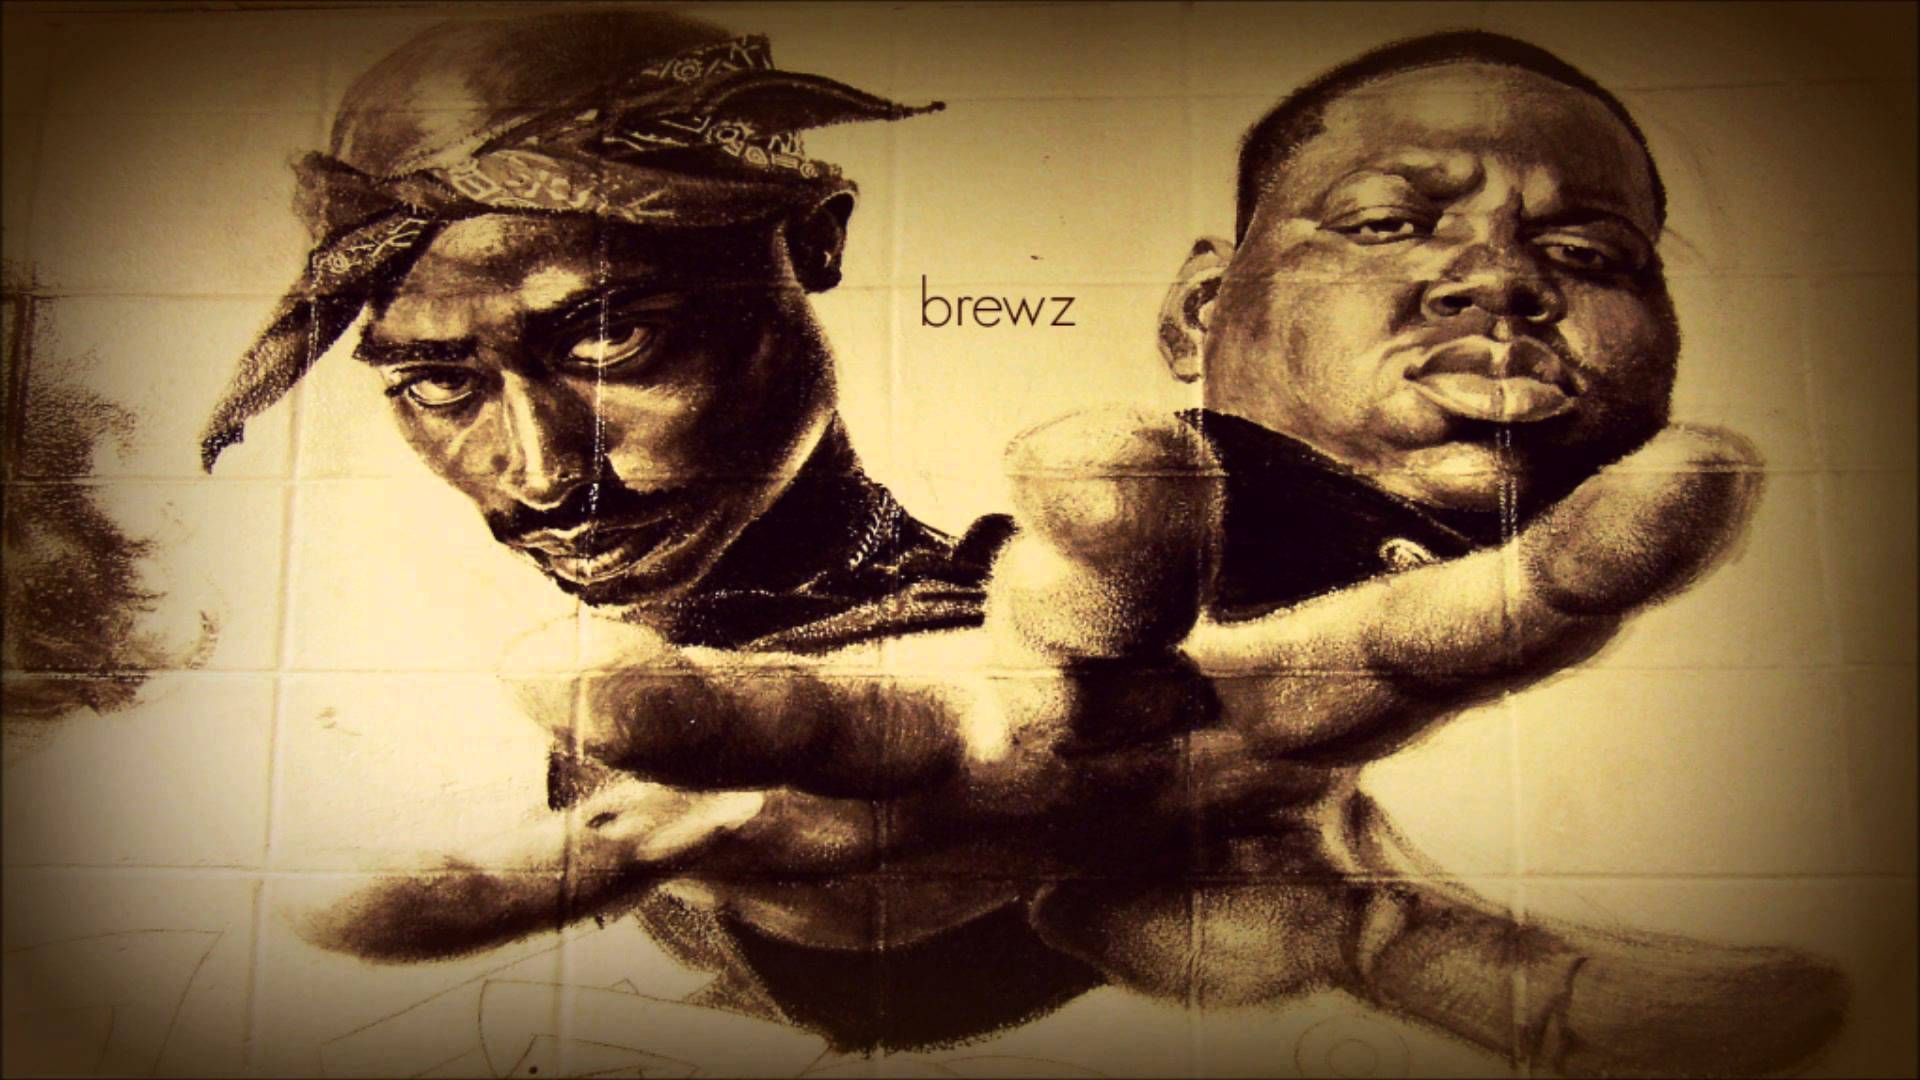 Brewz 2pac And Notorious B I G Coast To Coast Mix Youtube 2pac And Biggie Tupac And Biggie Tupac